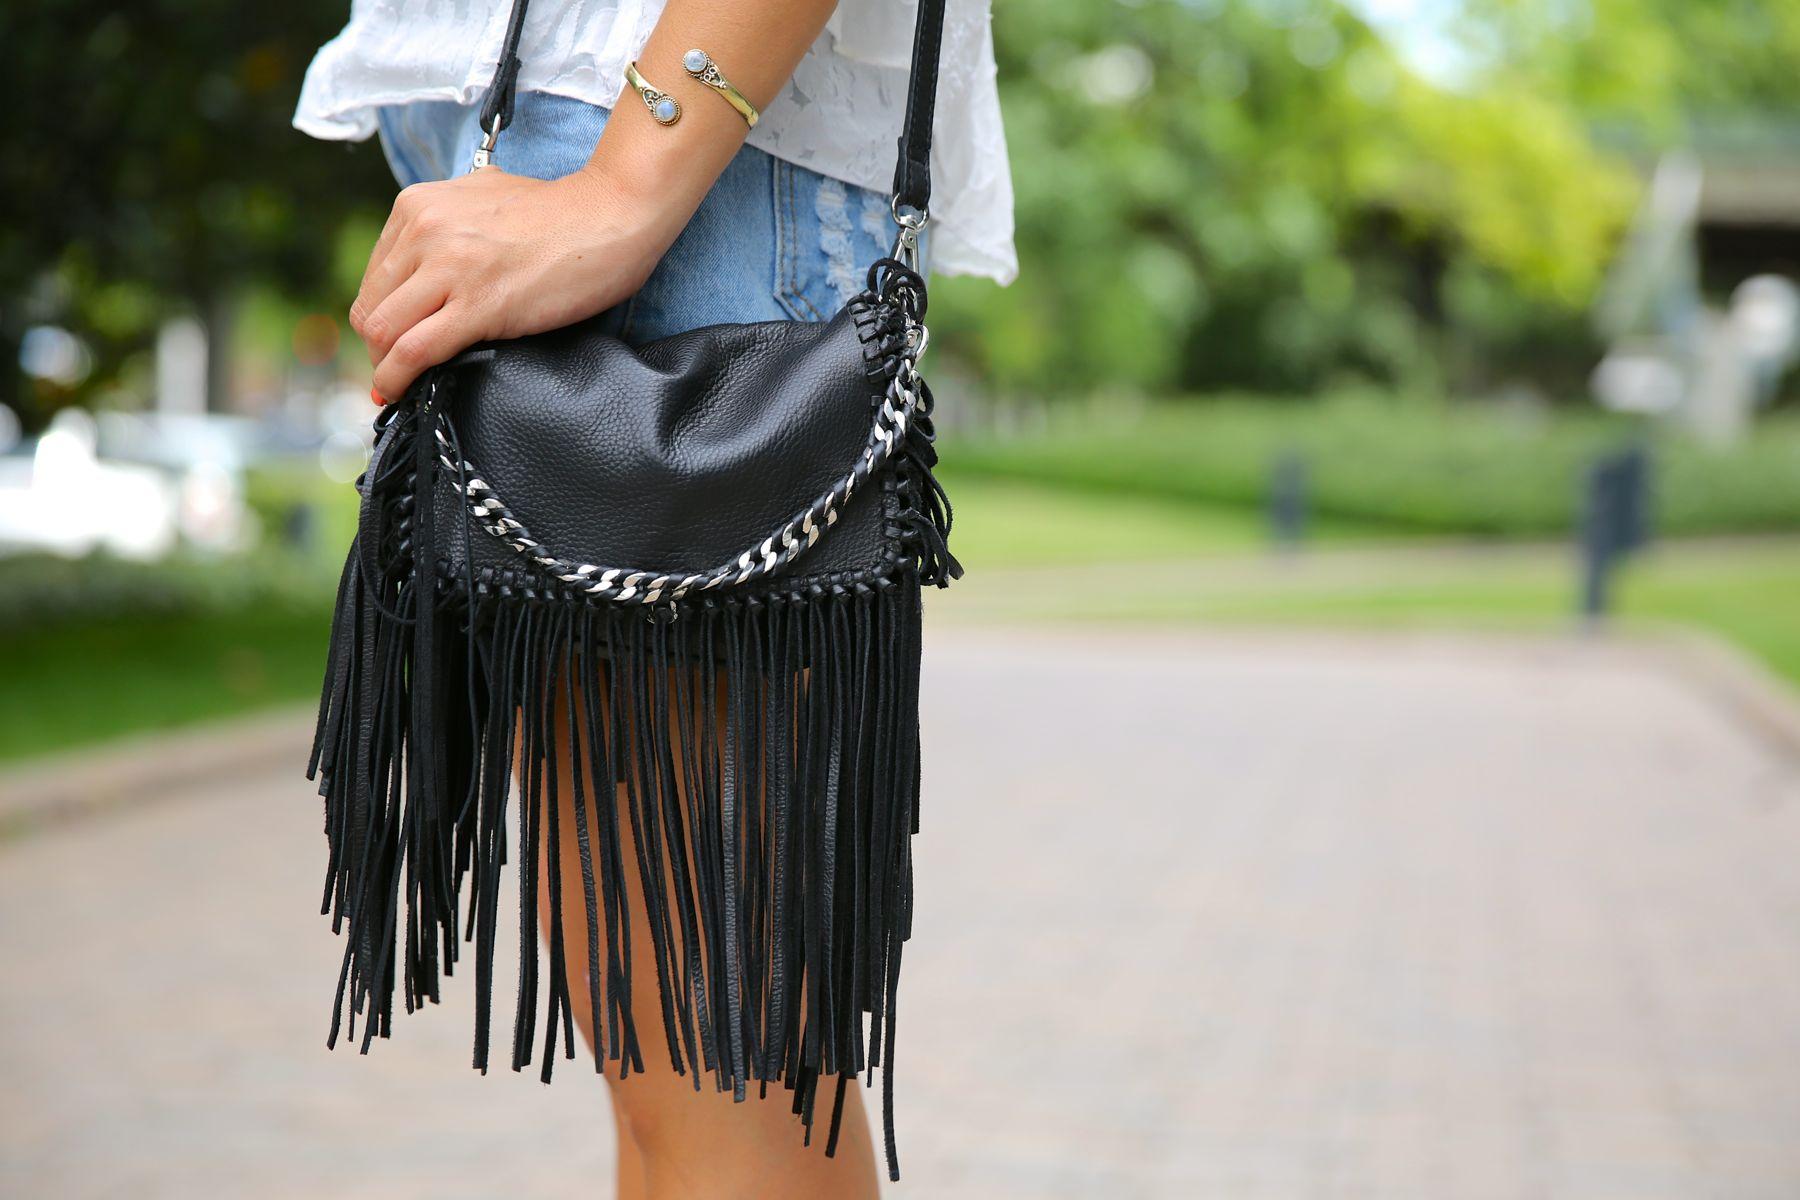 trendy_taste-look-outfit-street_style-ootd-blog-blogger-fashion_spain-moda_españa-fringed_bag-bolso_flecos-sandalias-verano-summer_sandals-ugg_australia-denim_shorts-shorts_vaqueros-oversize-3